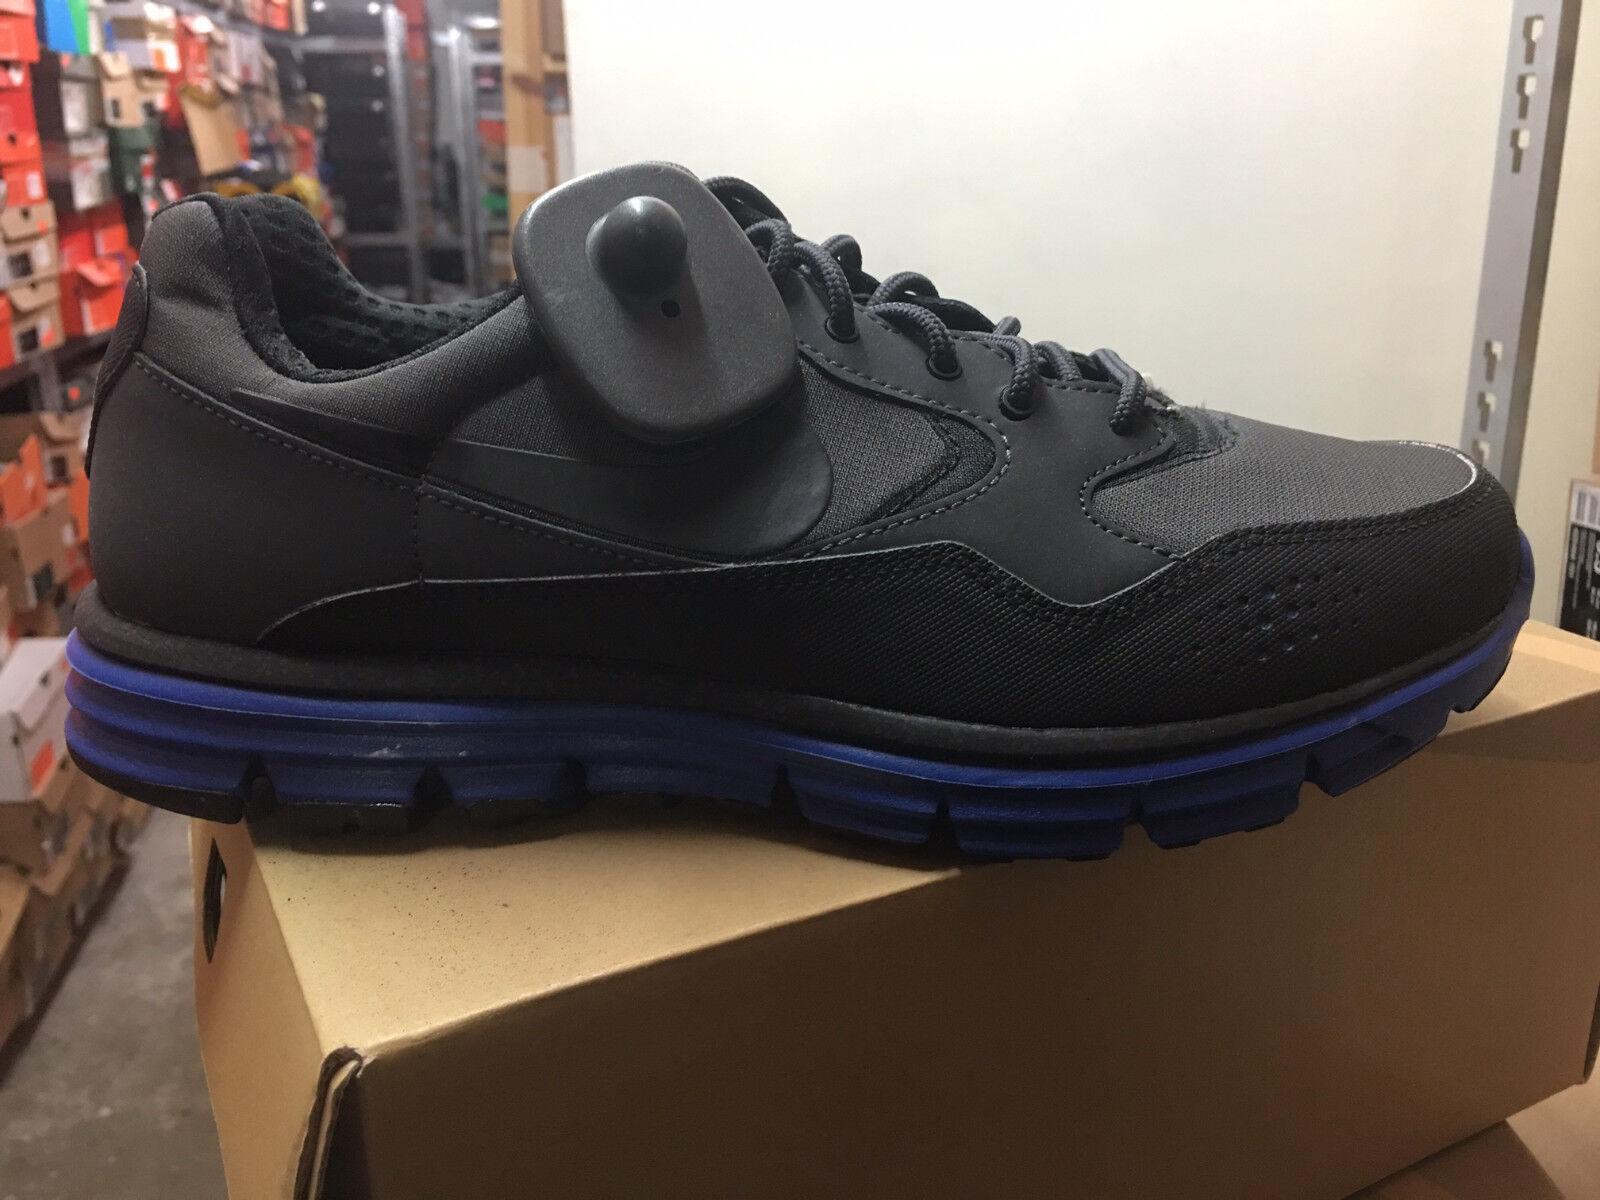 NIKE Lunar Wood+ Trendiger Sneaker Schuhe Gr:41 Grau/Blau Trendiger Wood+ Alltags Schuh Neu 0f9ed0